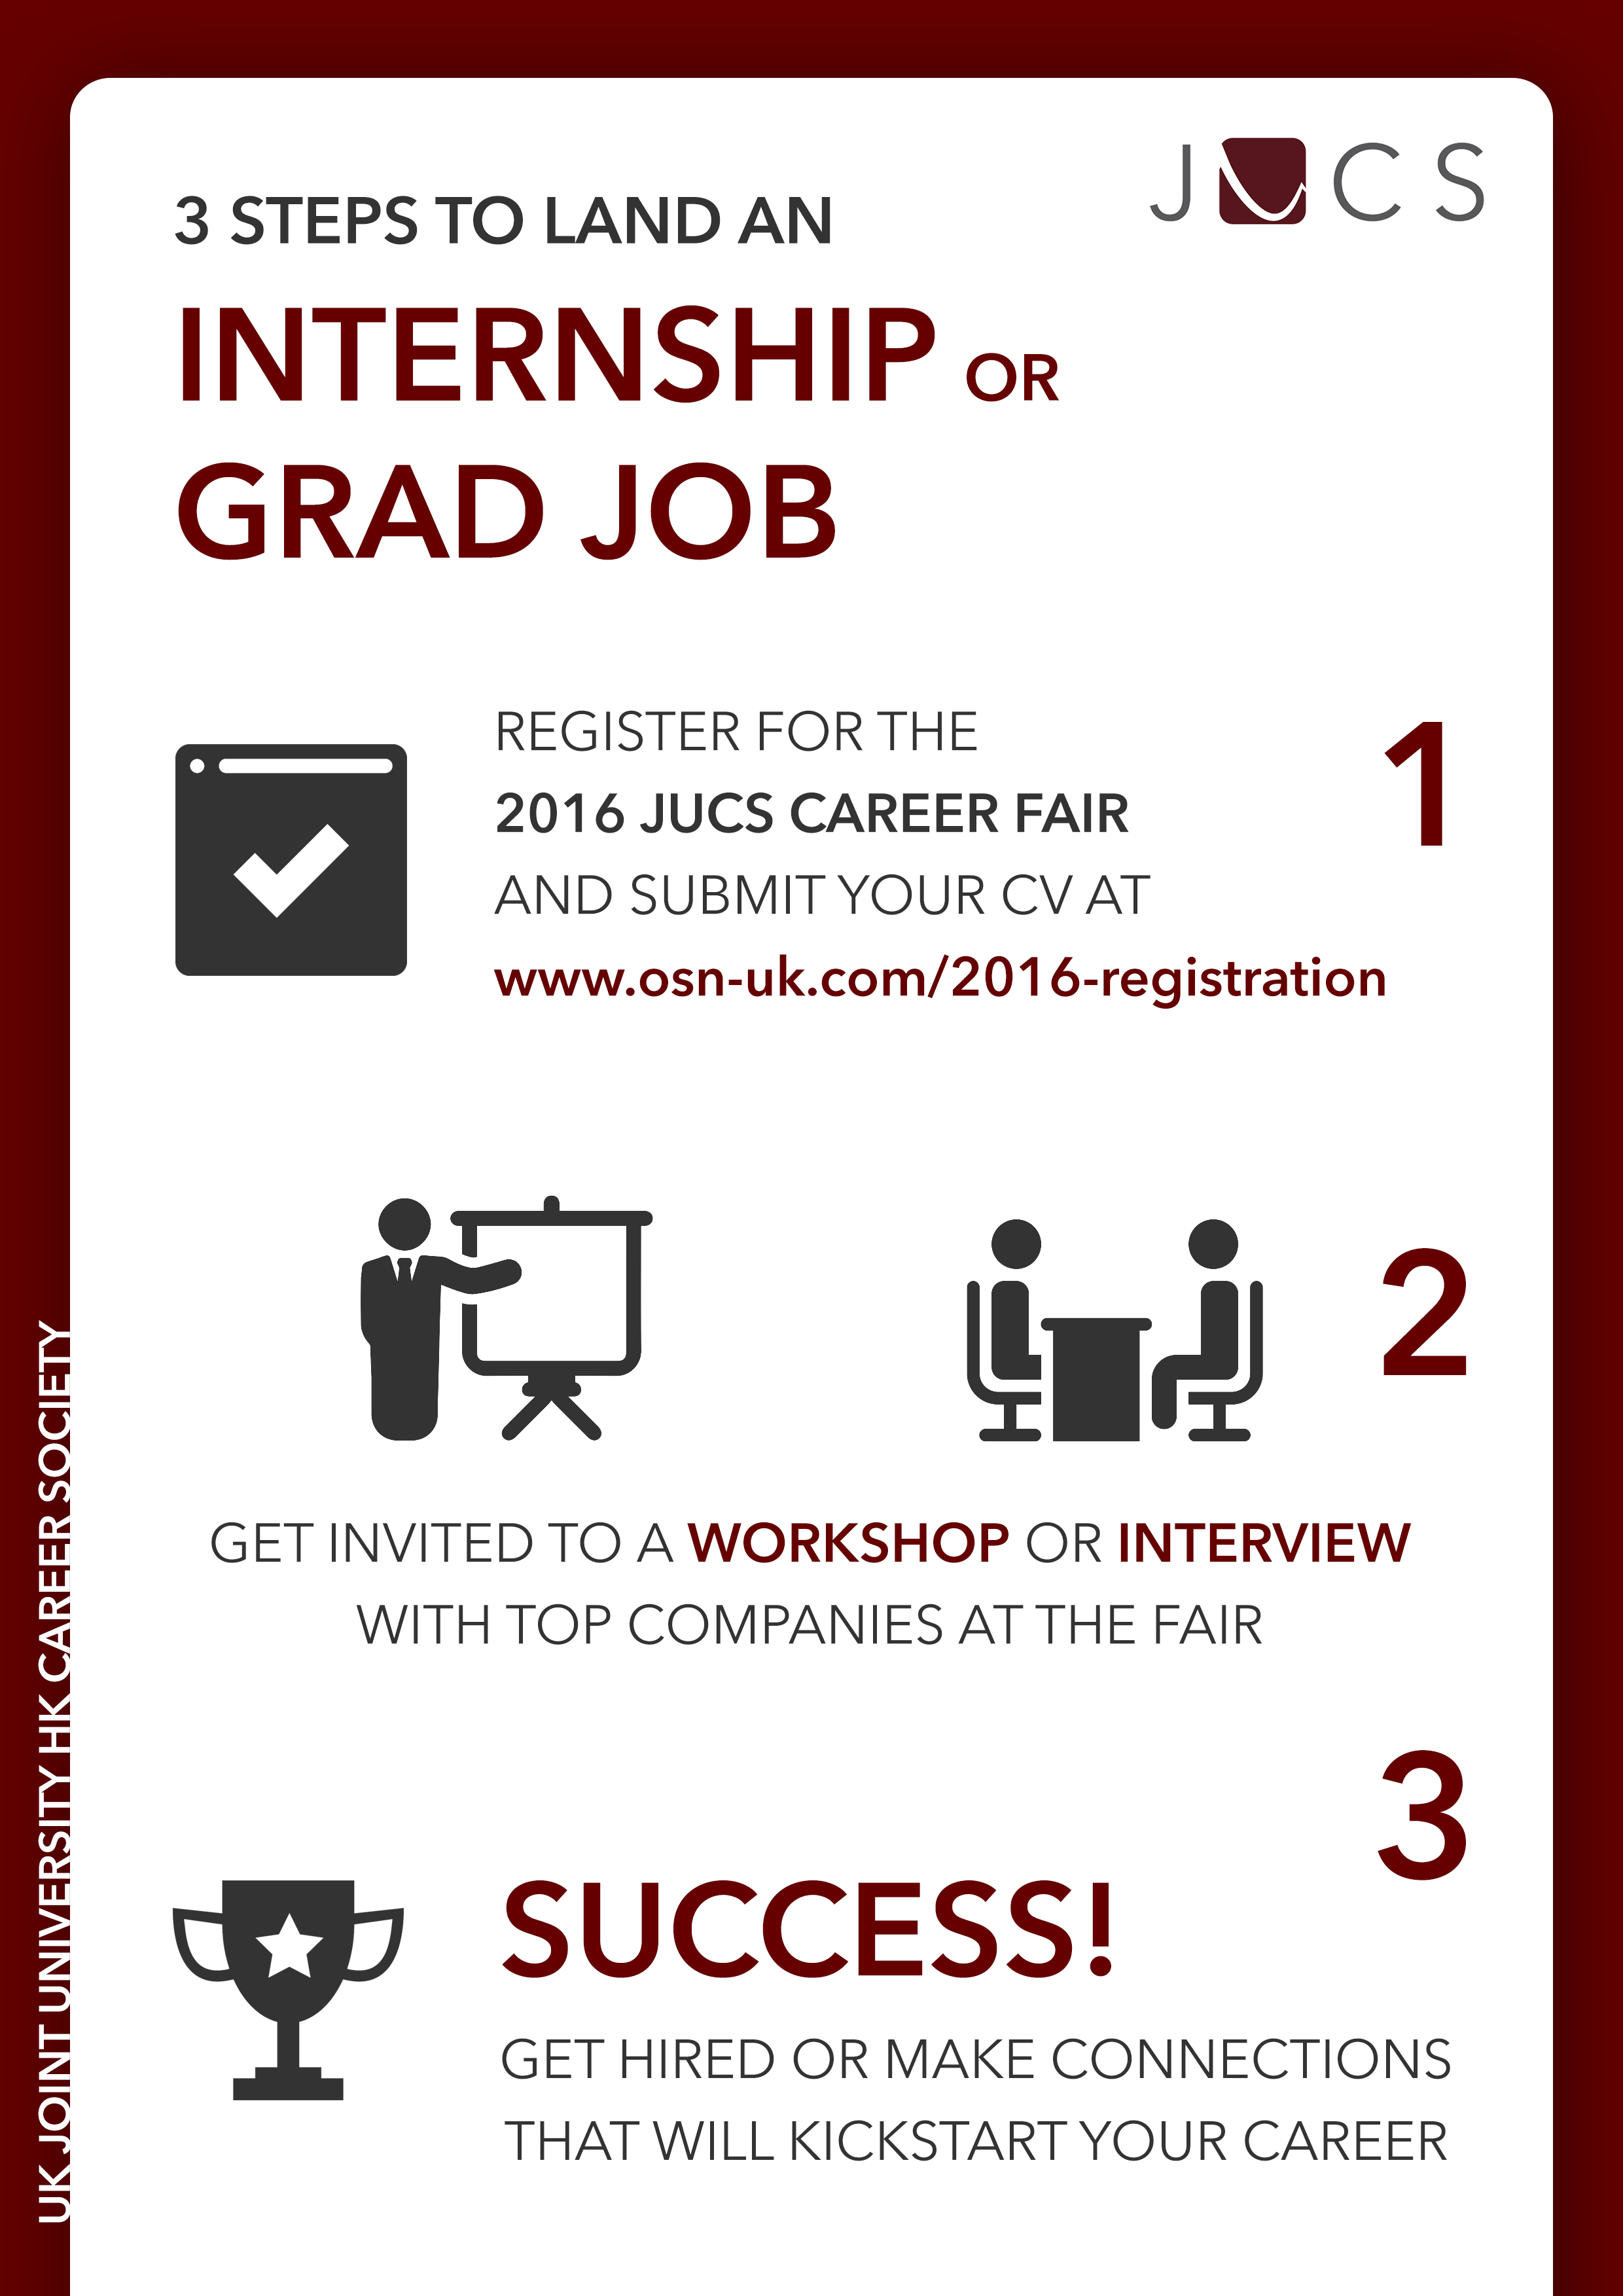 career advice jucs uk joint university hong kong career society 3 steps to land an internship grad job infographic